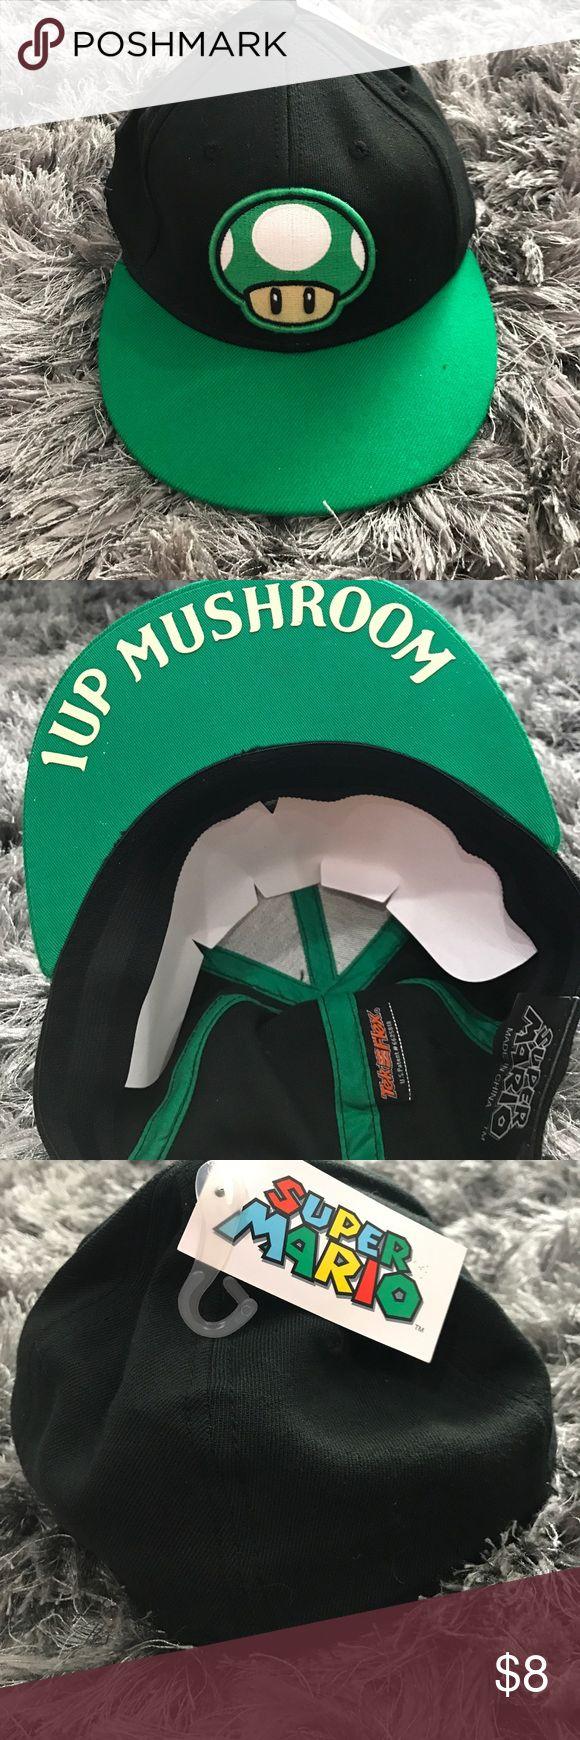 🔥New🔥 Adult Super Mario Mushroom Flex Hat NWT